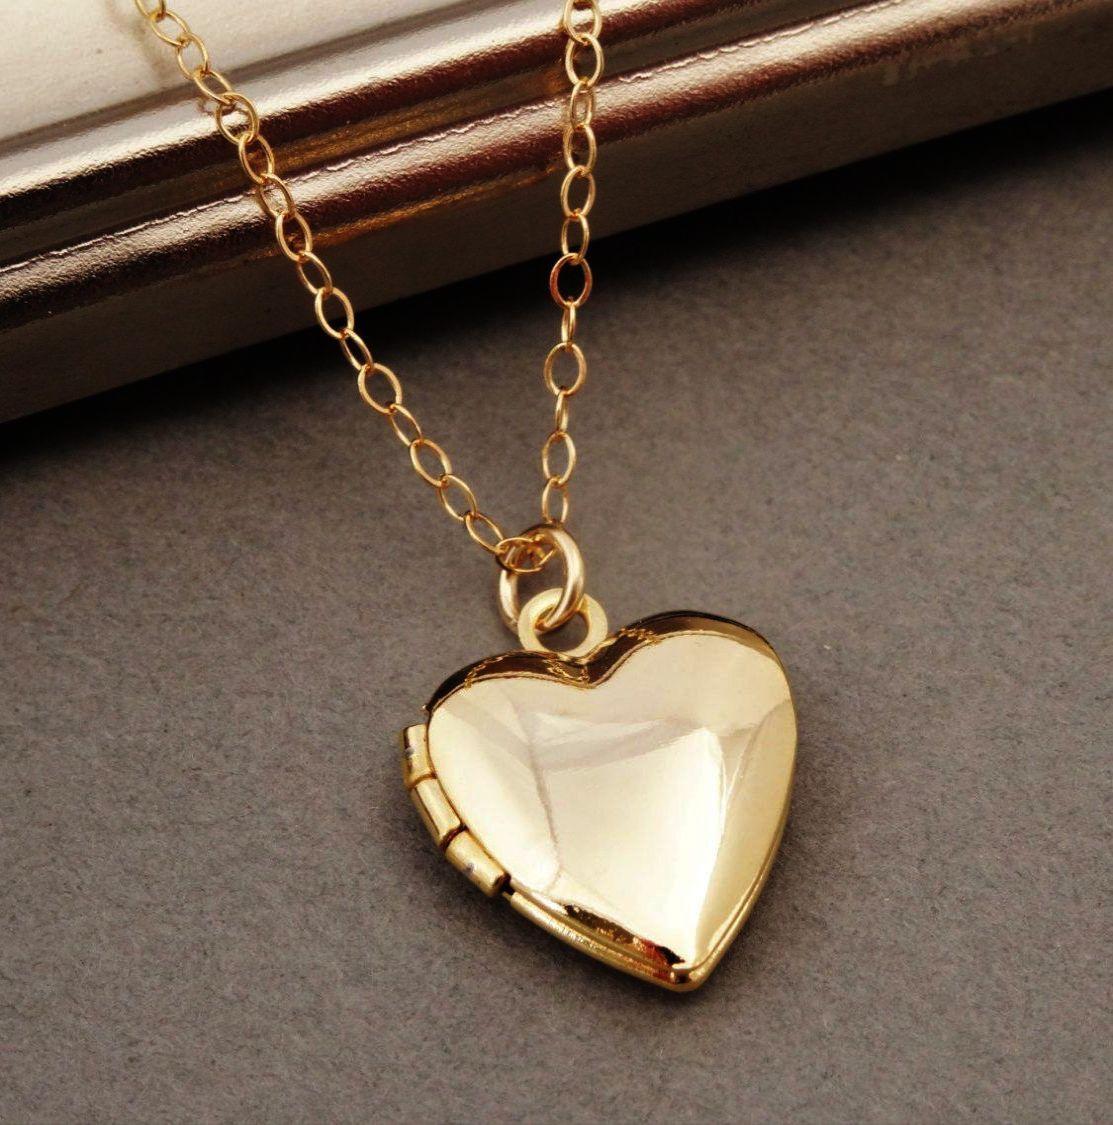 Fantastic Locket Necklace With Charms Inside Australia D Locket